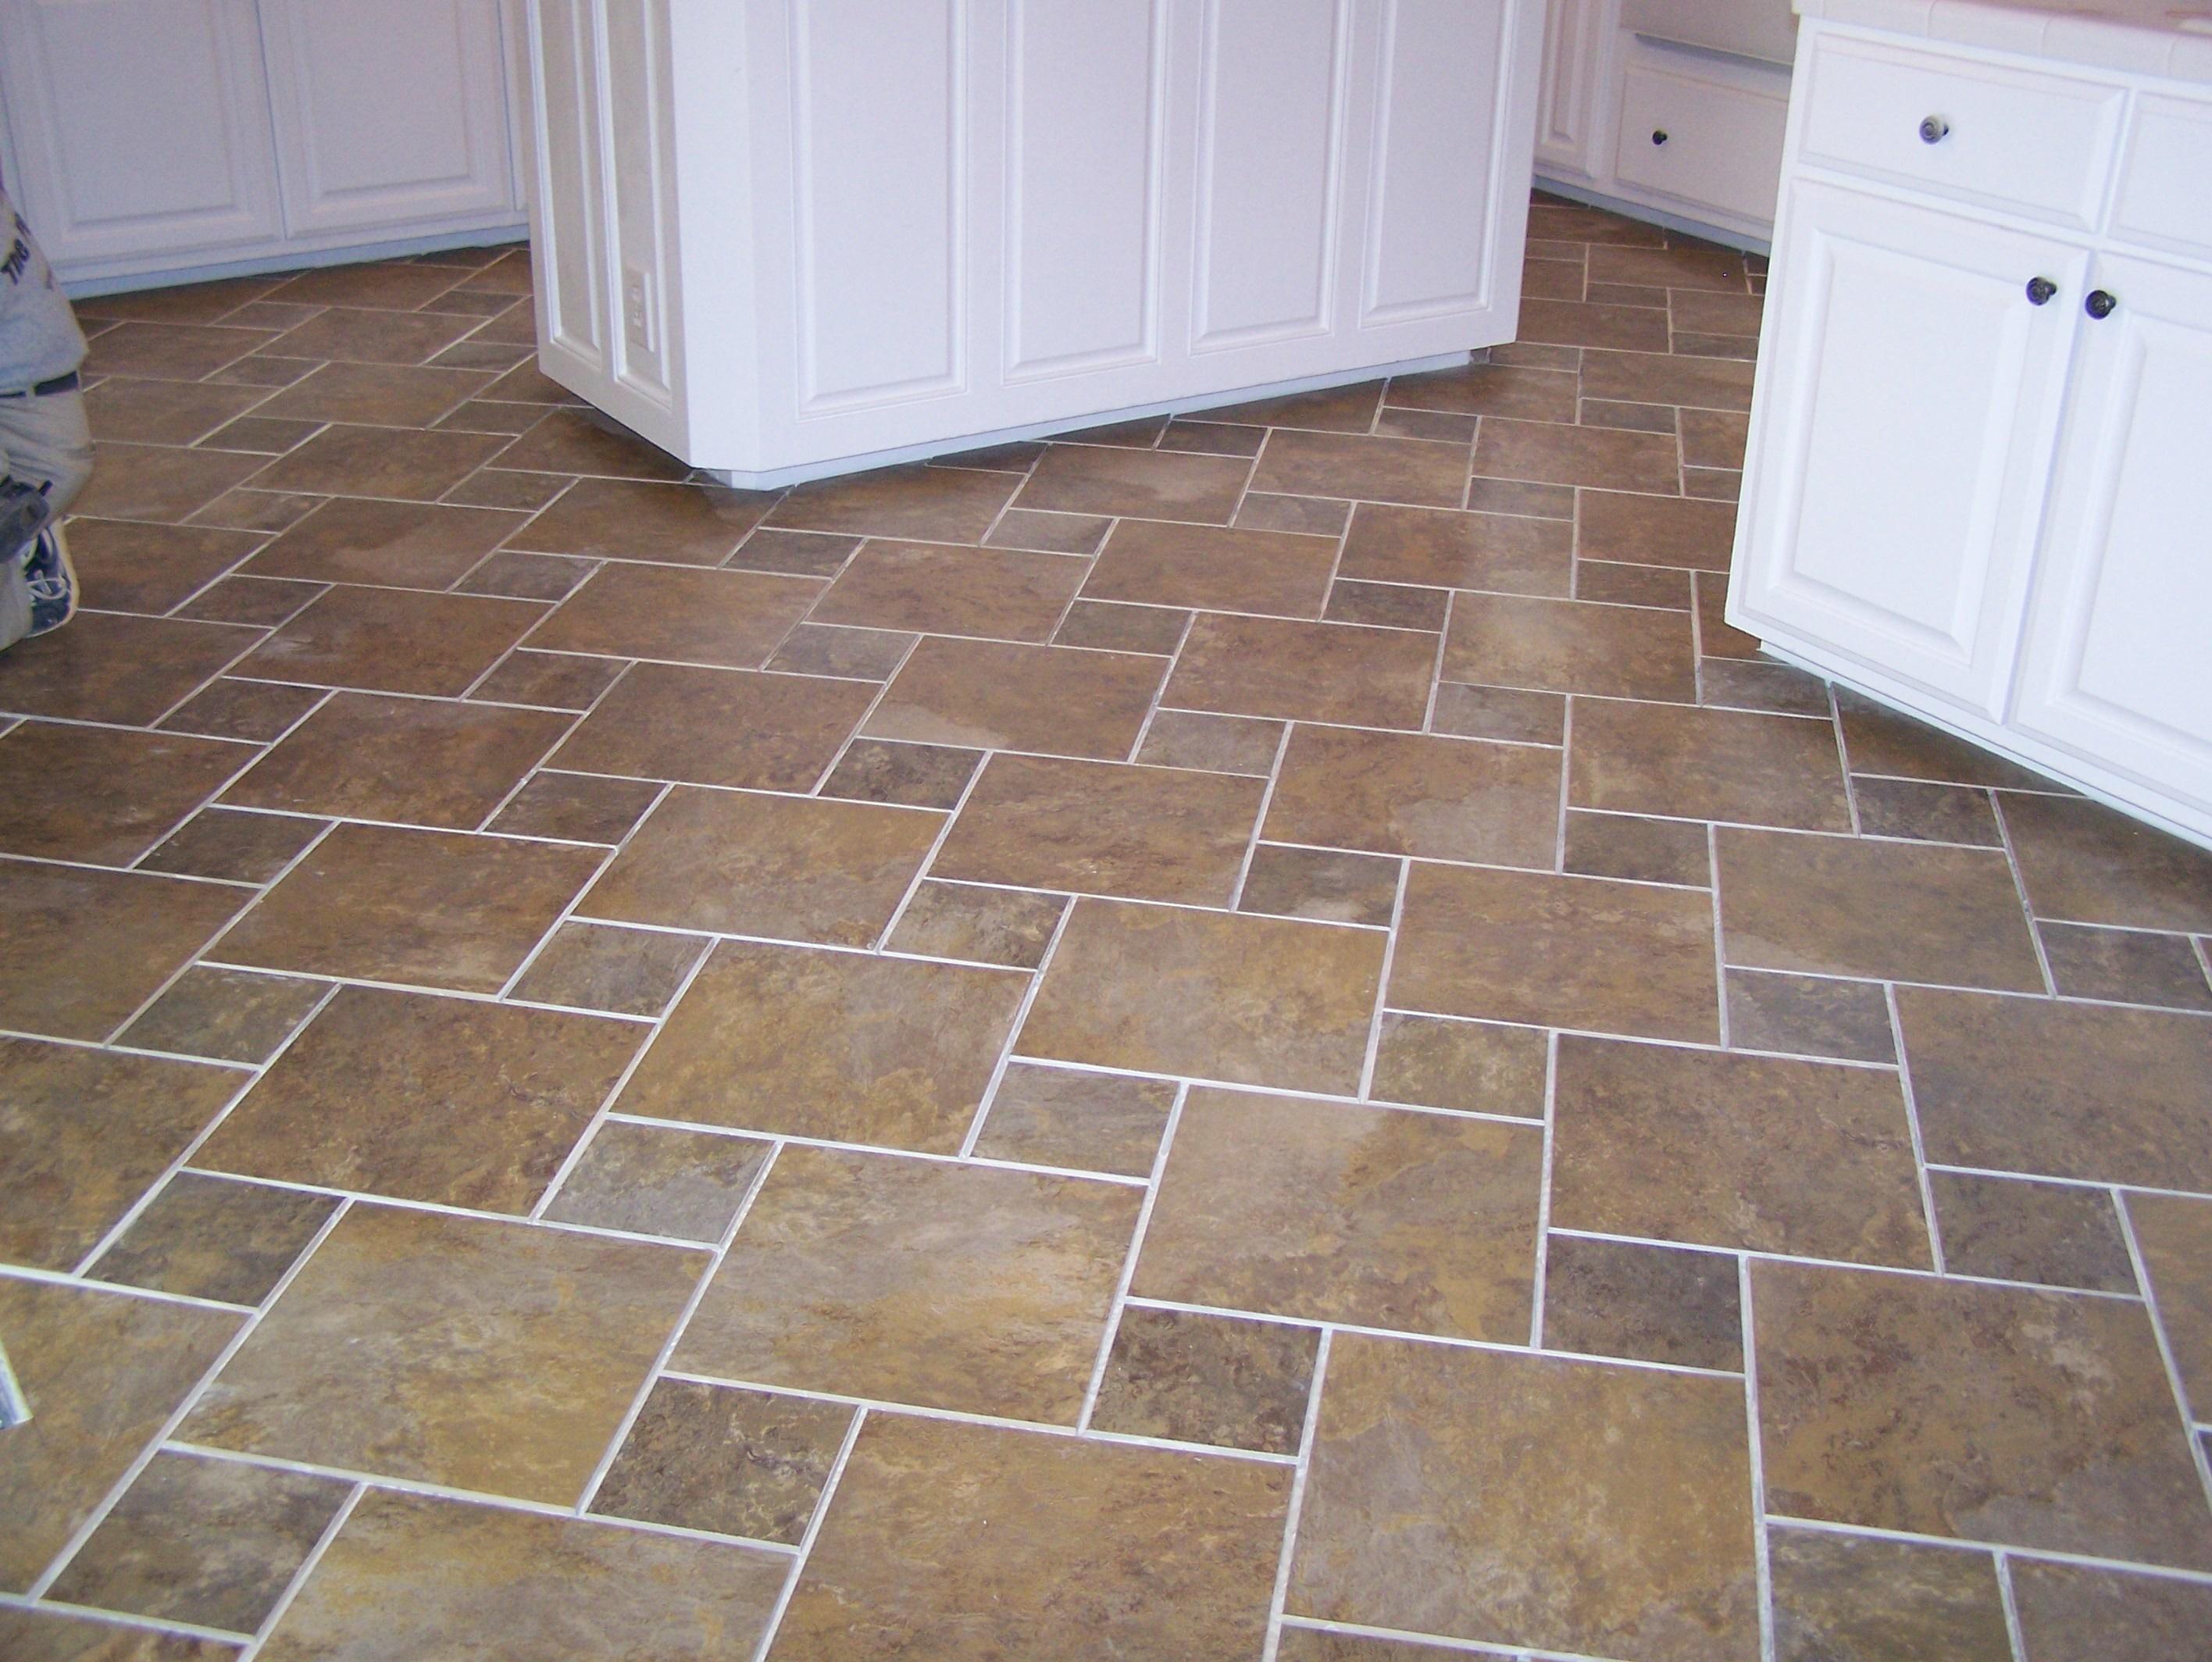 Install Ceramic tile 3